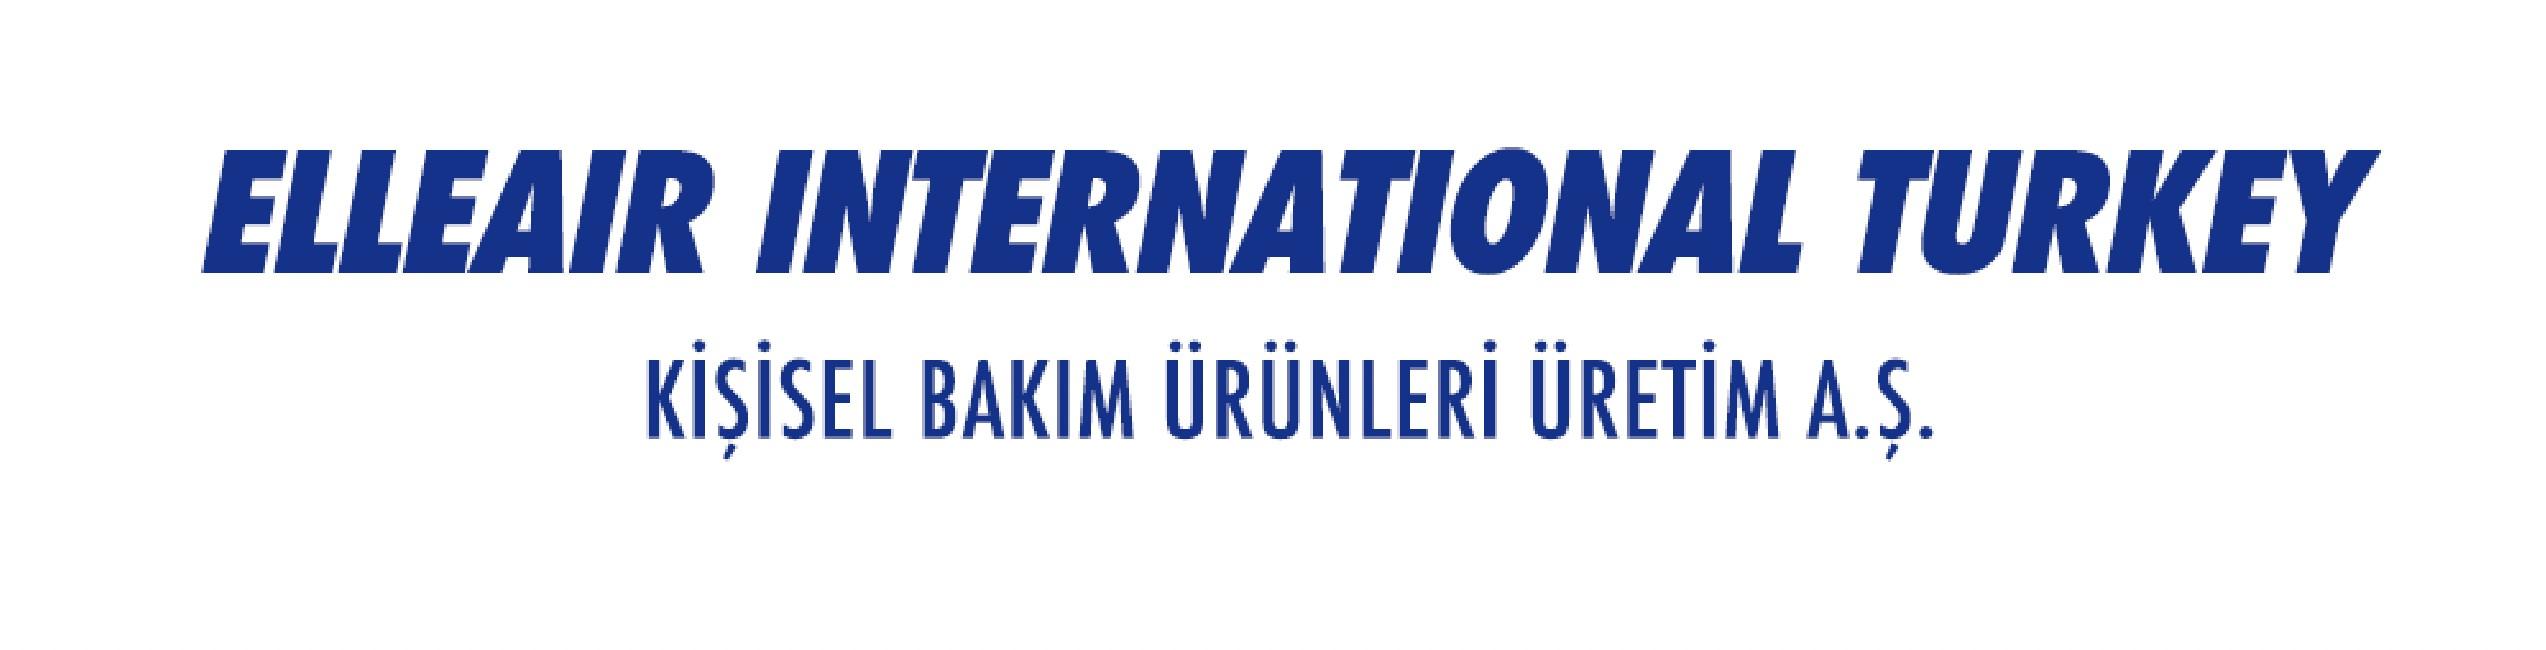 ELLEAIR INTERNATIONAL TURKEY KISISEL BAKIM URUNLERI URETIM A.S.